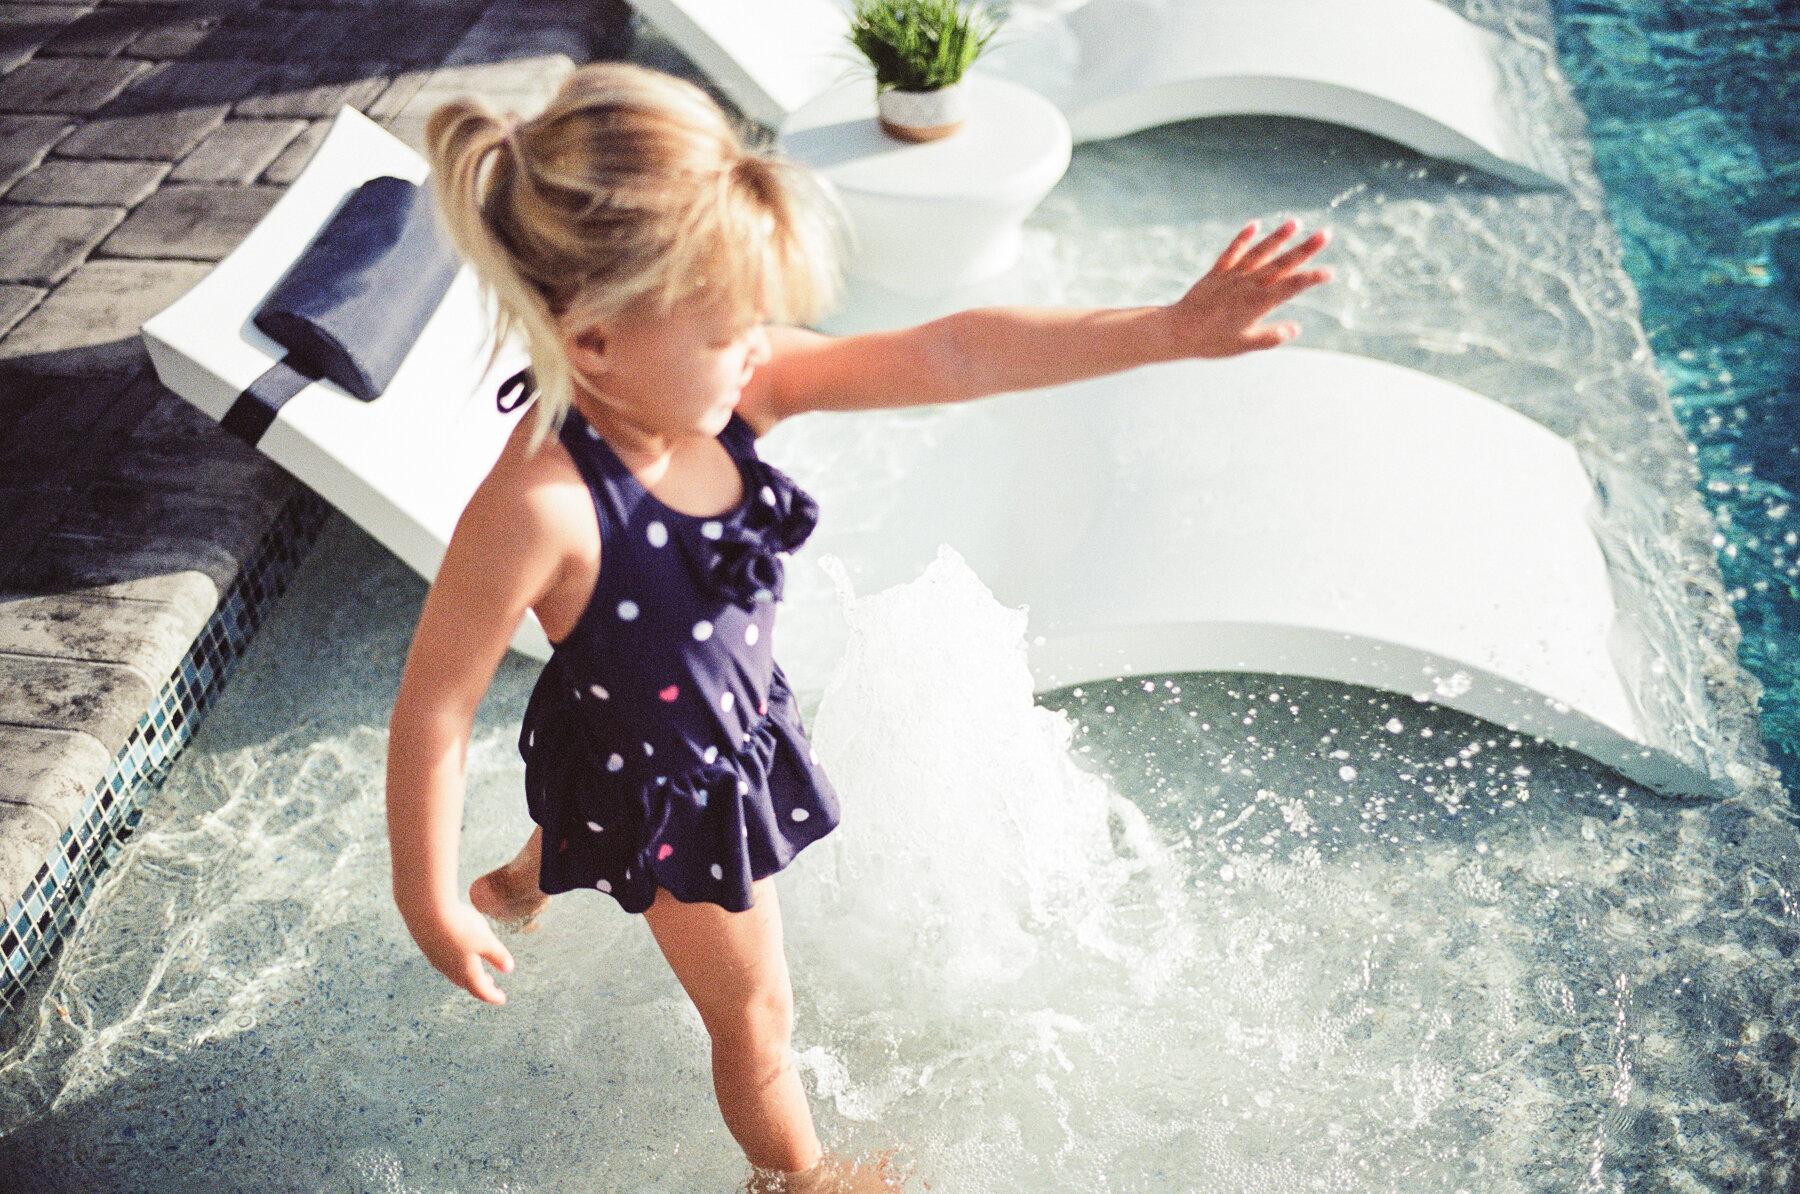 Leica-M6-Pool-Chloe-24.jpg